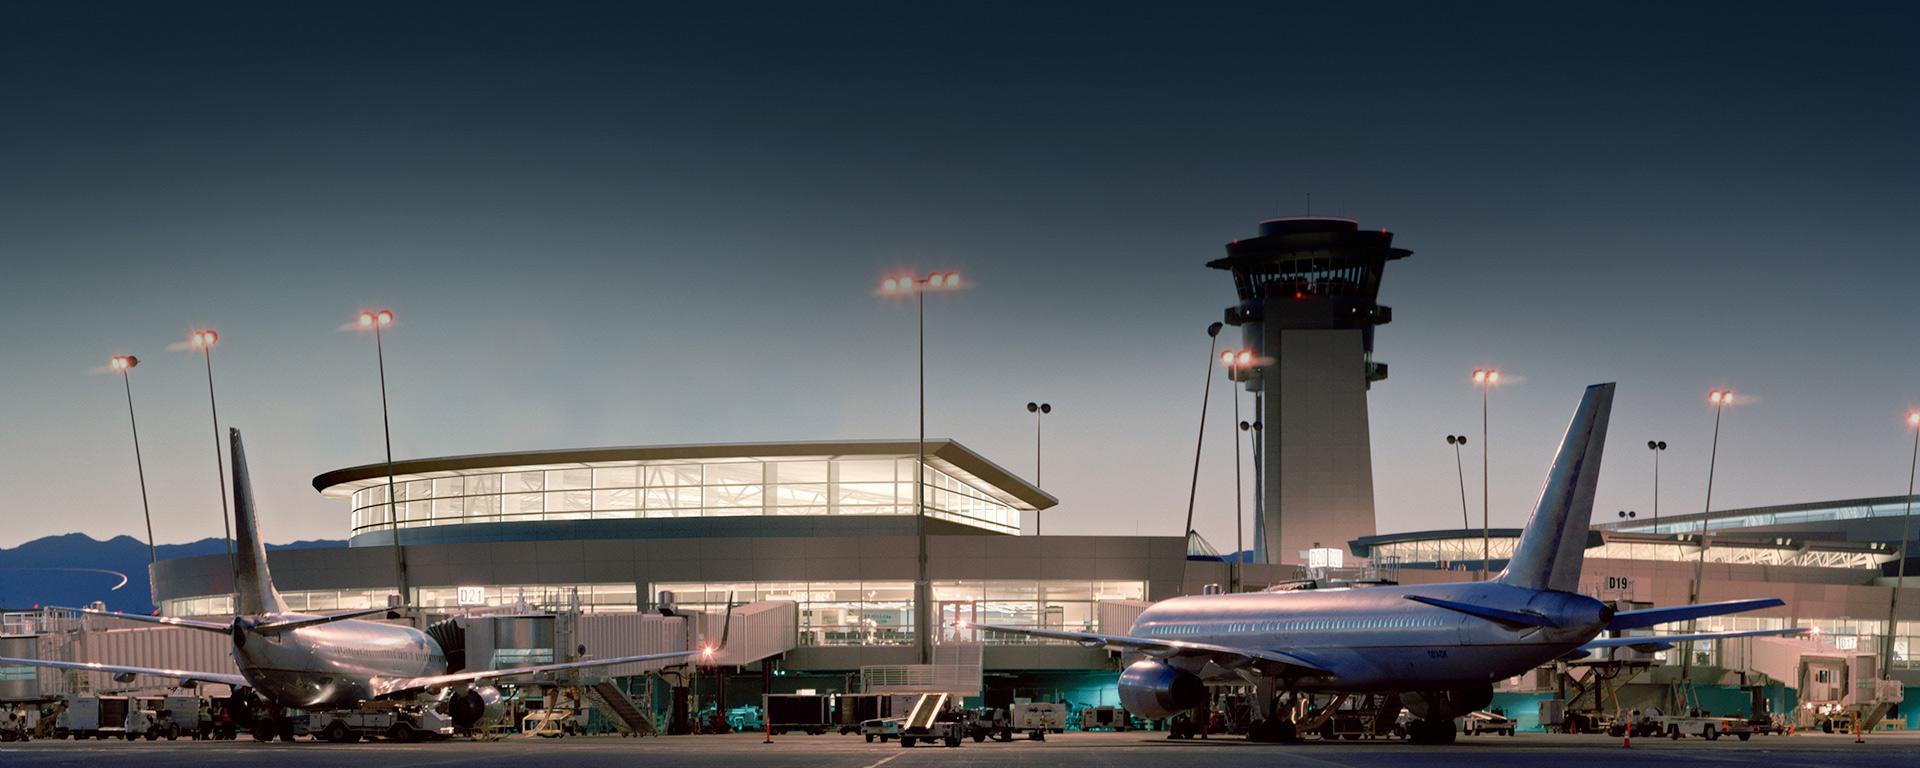 Airport Operations Coordinator